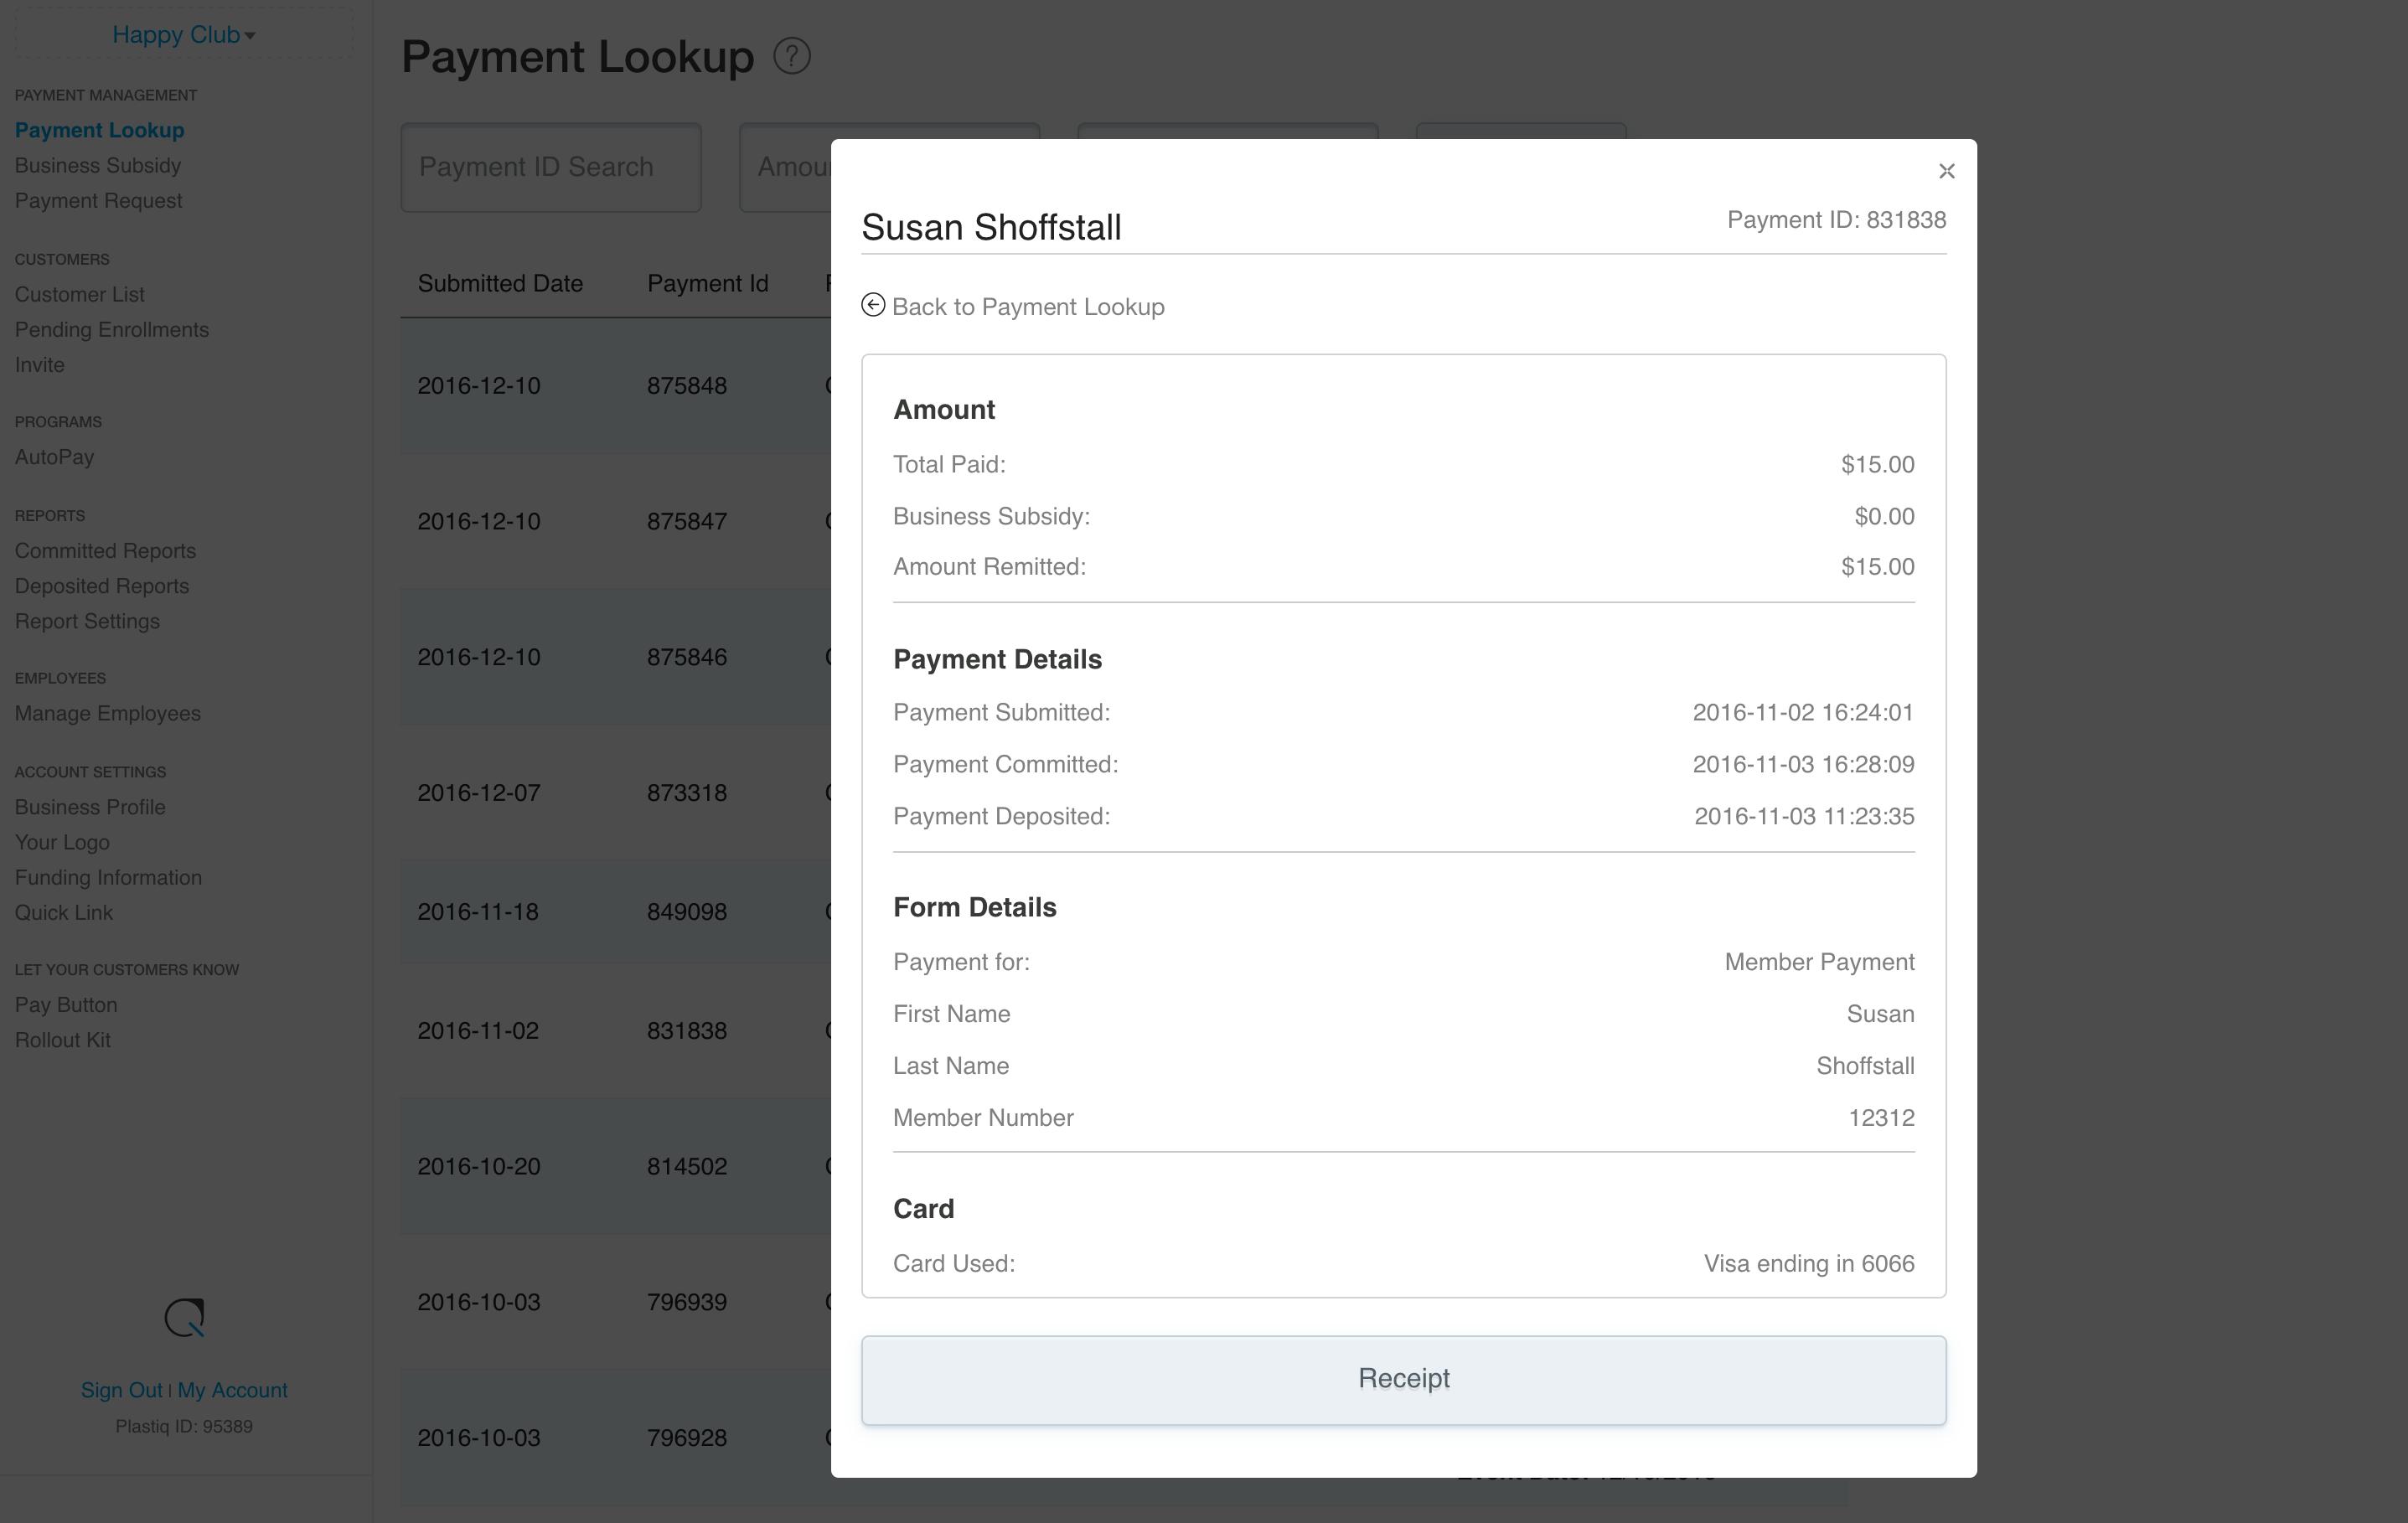 https://s3.amazonaws.com/elevio-article-assets/576aa3d79f158/58c9c1d2b5b9c_plastiq-businesss-portal-application-payment-lookup.png